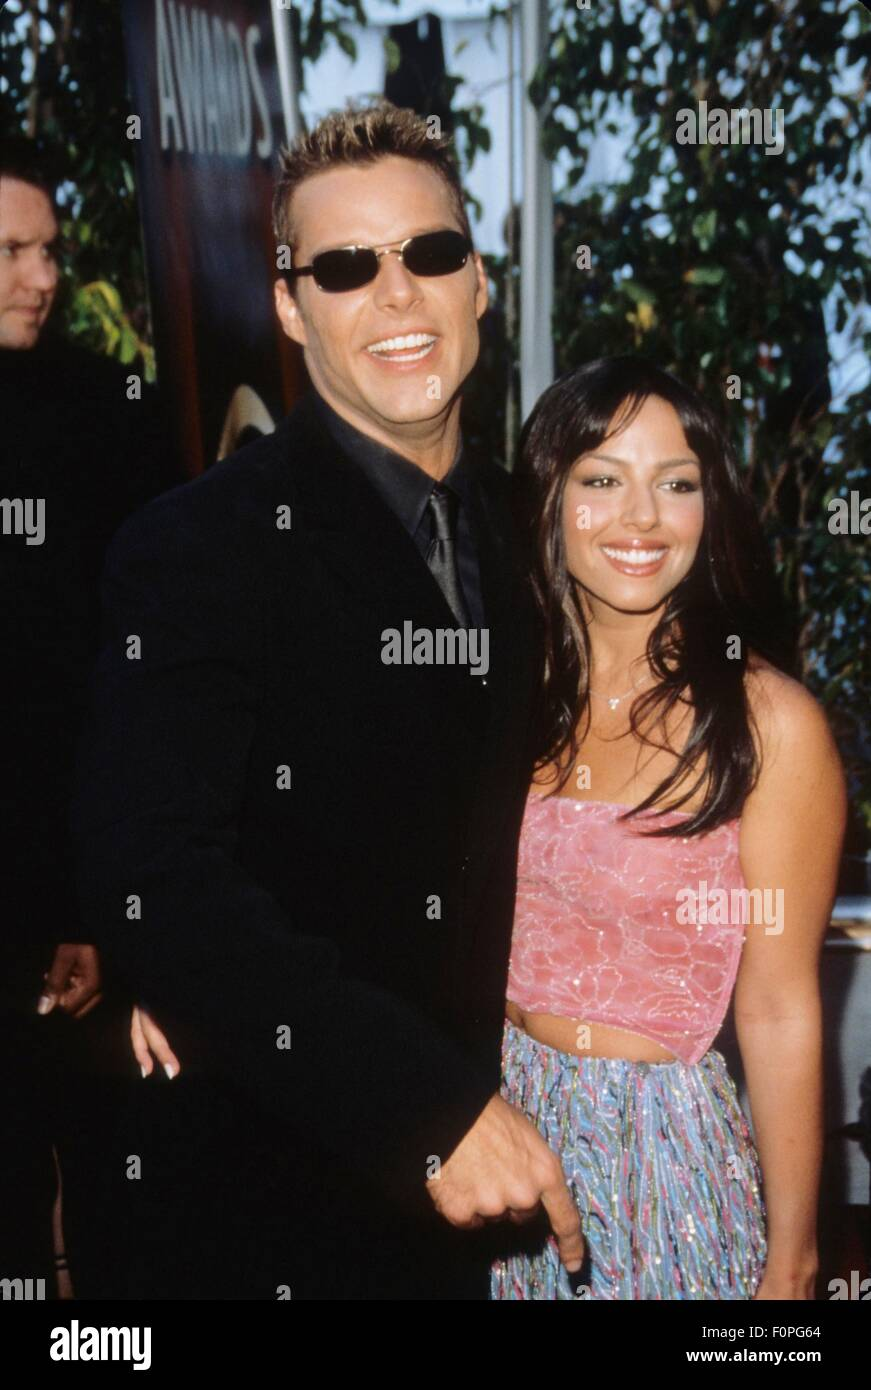 RICKY MARTIN At 1999 MTV Video Music Awards Metropolitan Opera House New York 1999k16528am